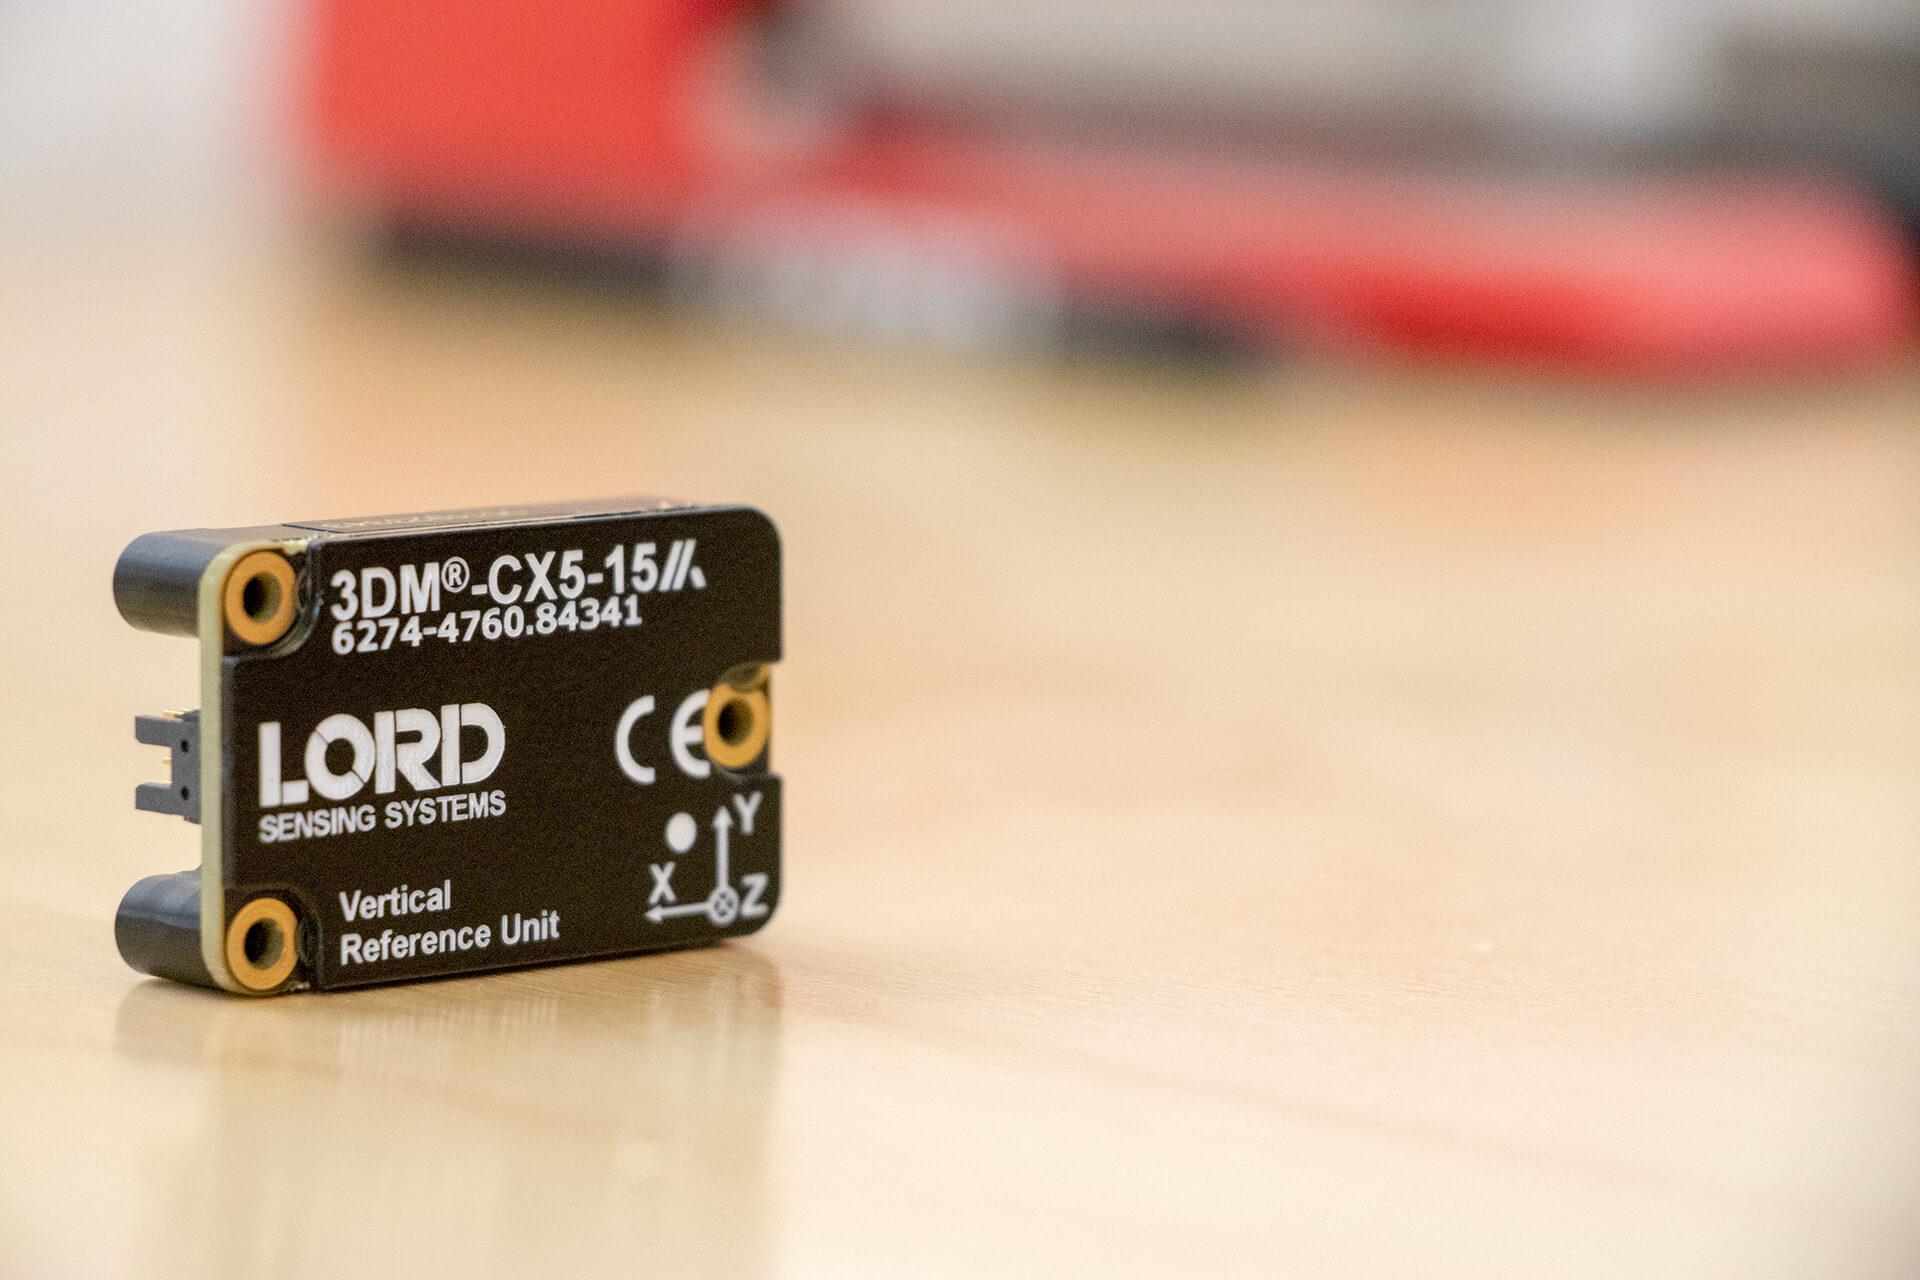 3DM-CX5-15 - 36.0 mm x 36.6 mm x 11 mm